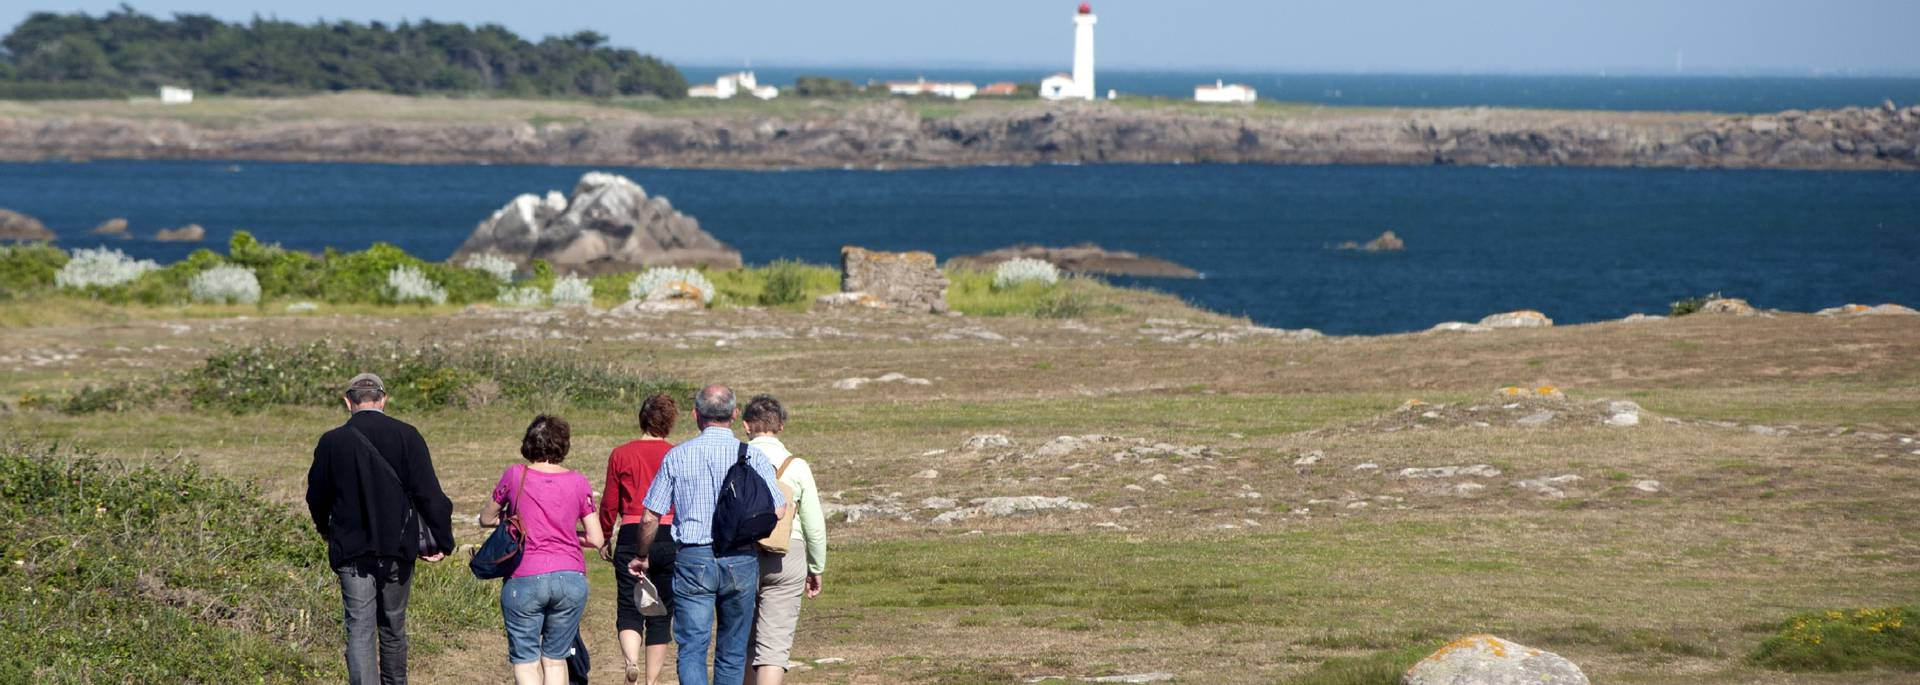 Fußwanderung - Pointe des Corbeaux, Ile d'Yeu